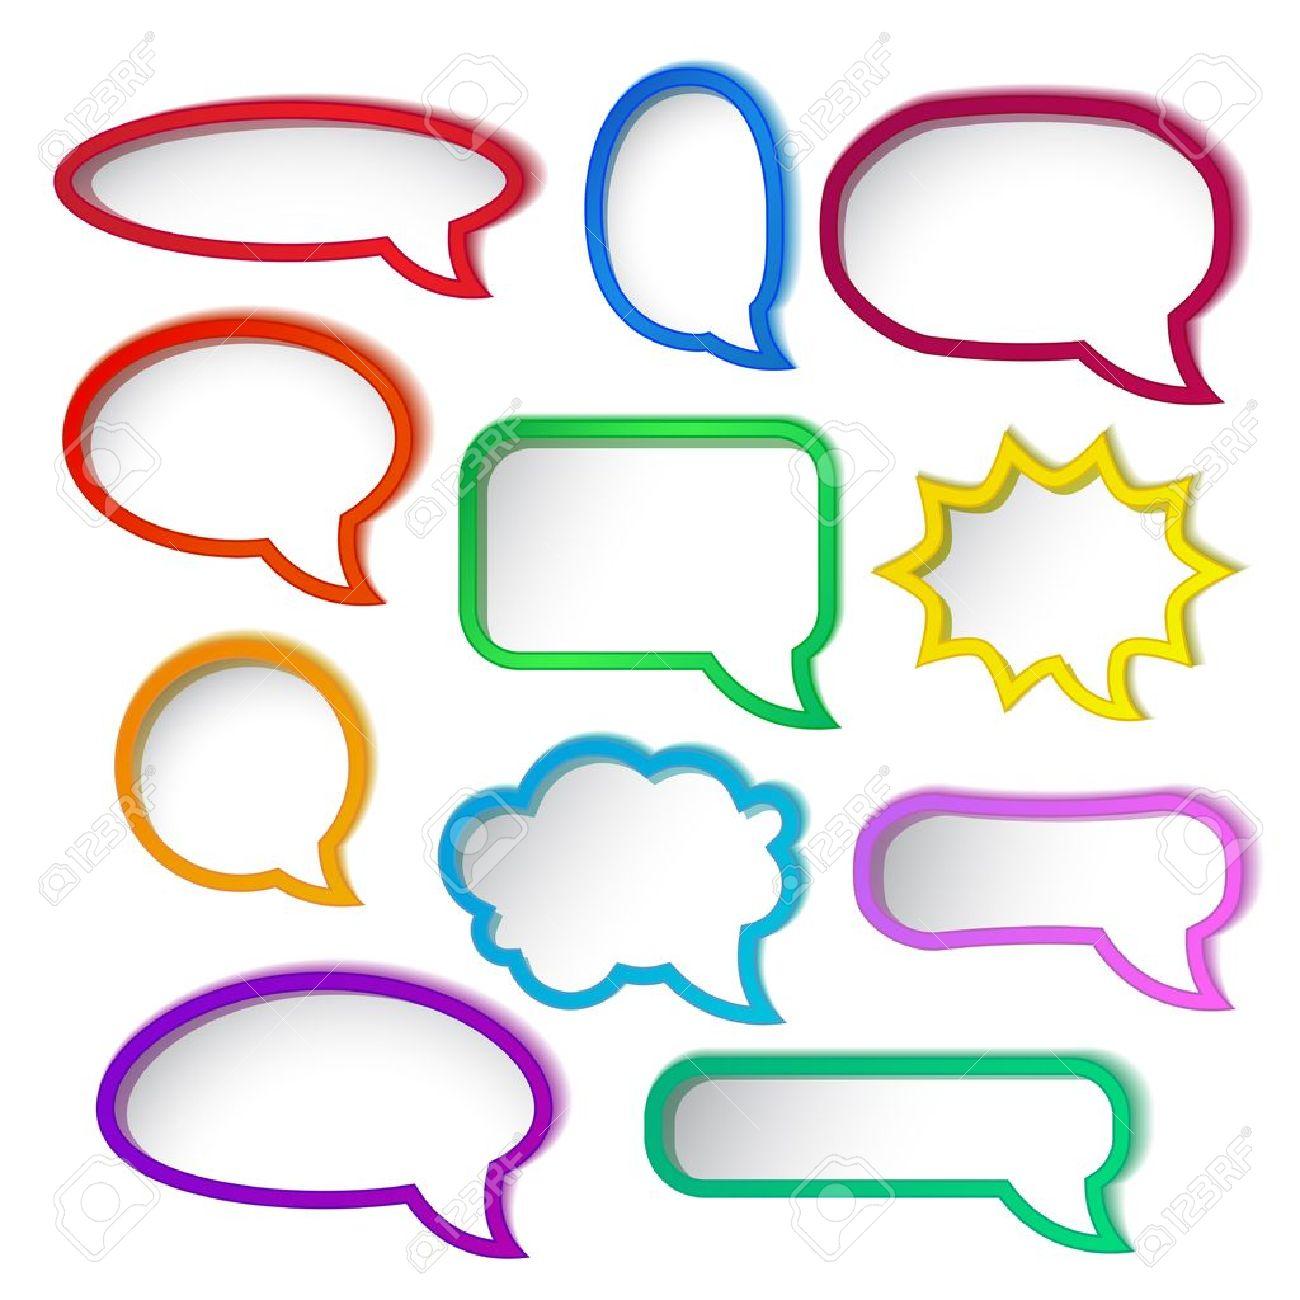 Set of colorful speech bubble frames Stock Vector - 15661952